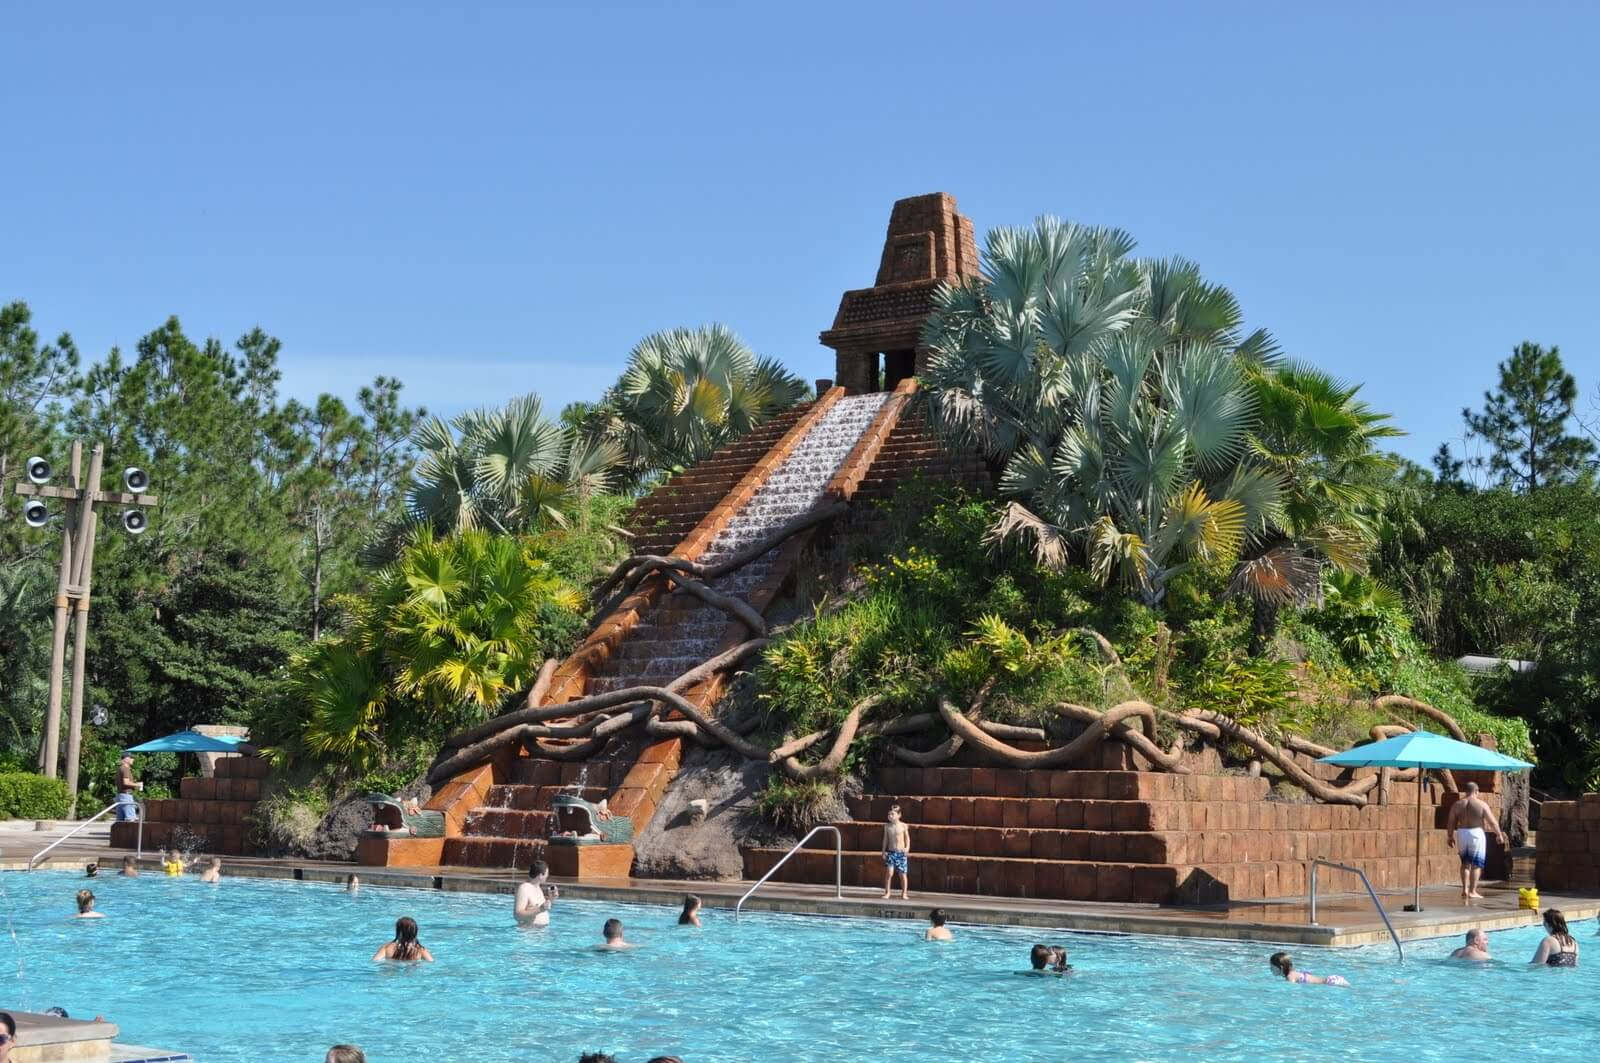 The Dig Site Pool Complex at Disney's Coronado Springs Resort